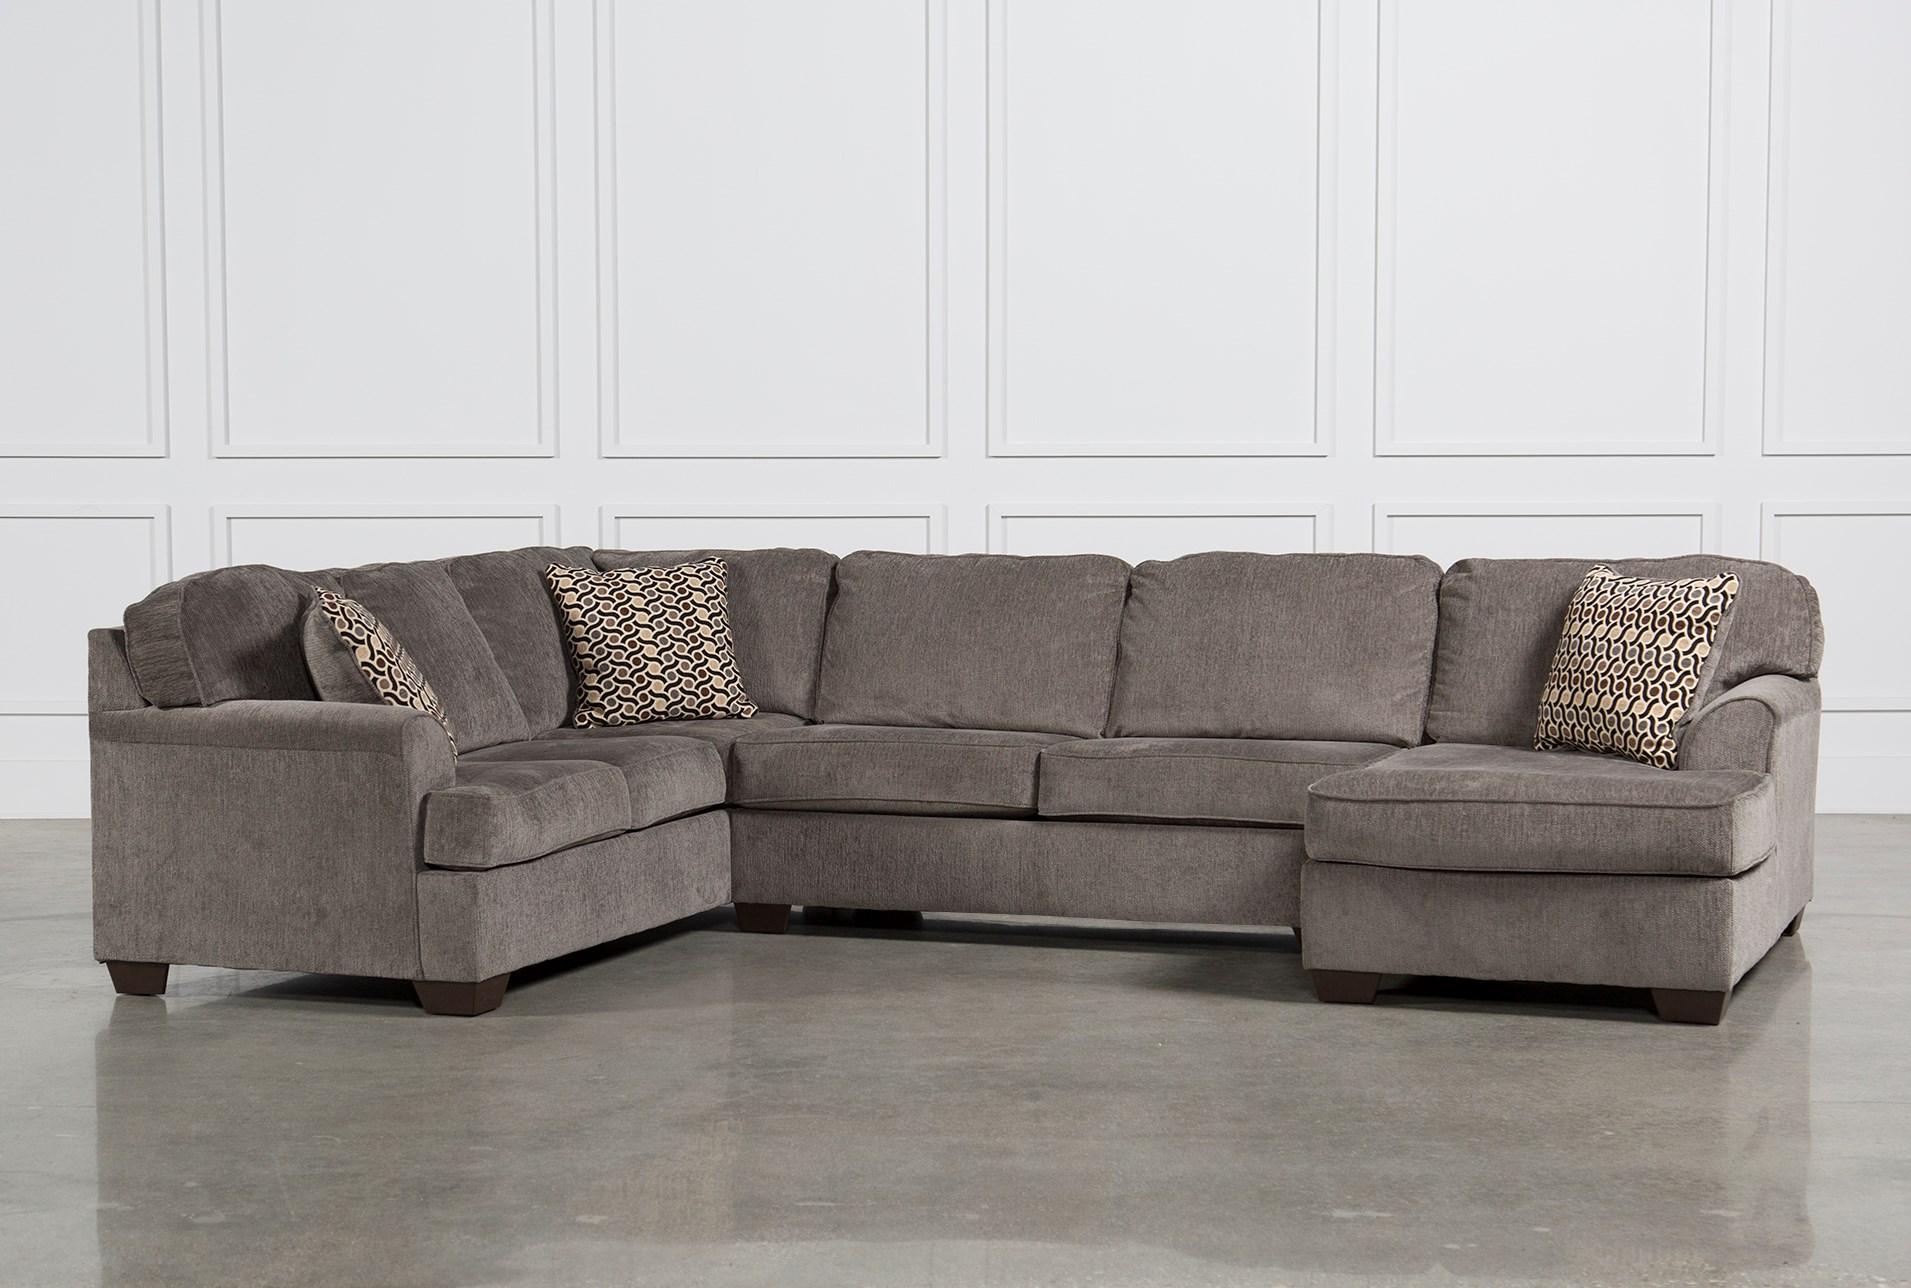 100 Inch Sofa With Chaise Baci Living Room